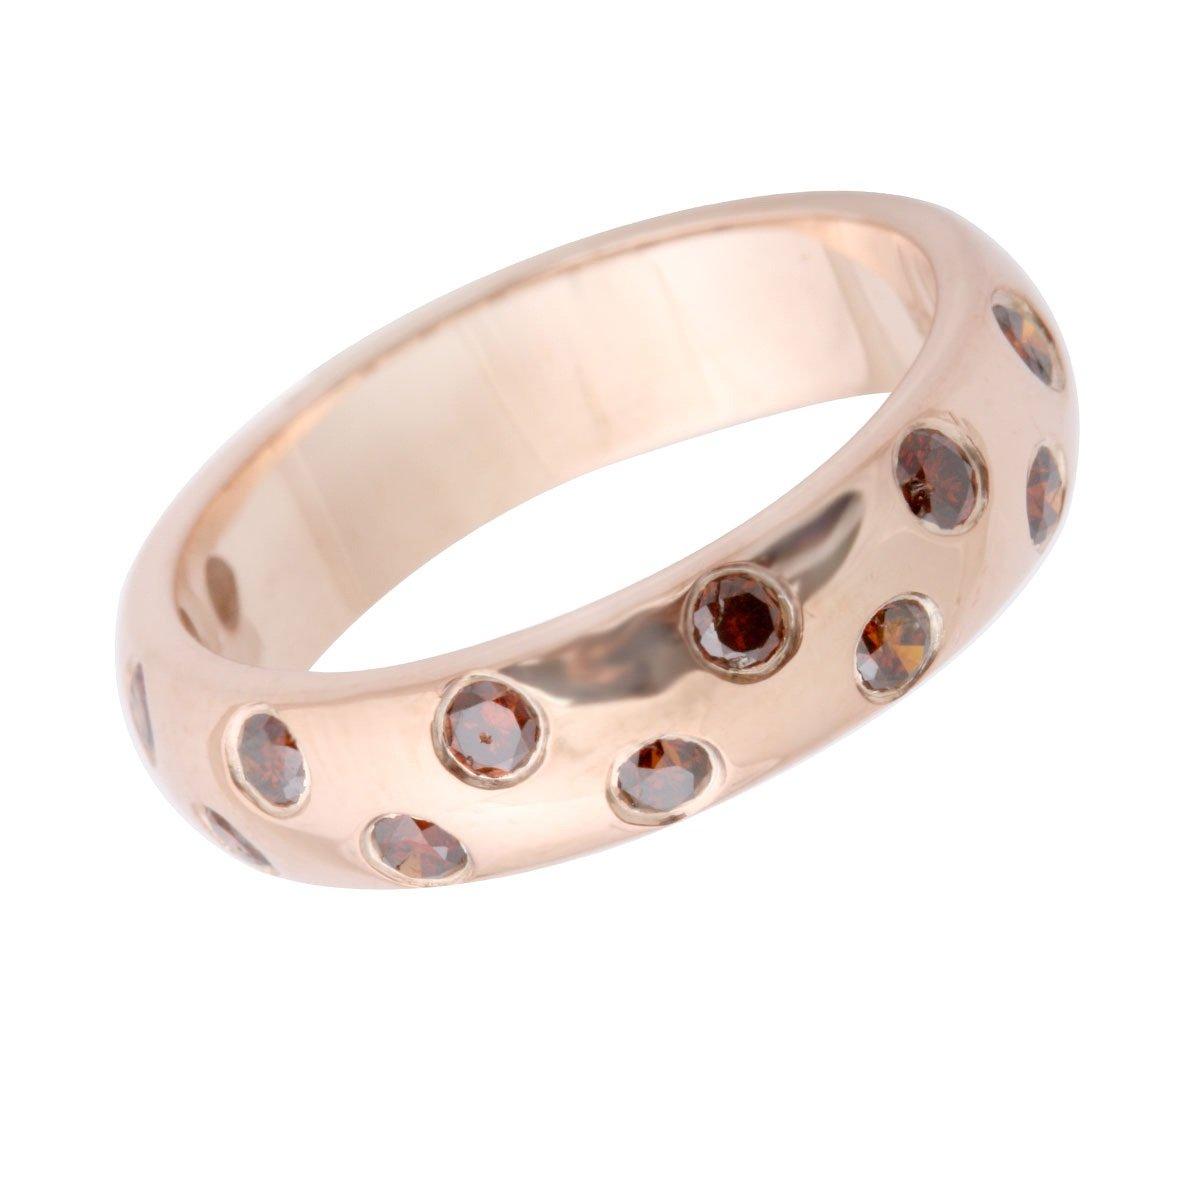 Goldenstar 0.50Ct 925 Sterling Silver Fancy Band Cognac Diamond Ring